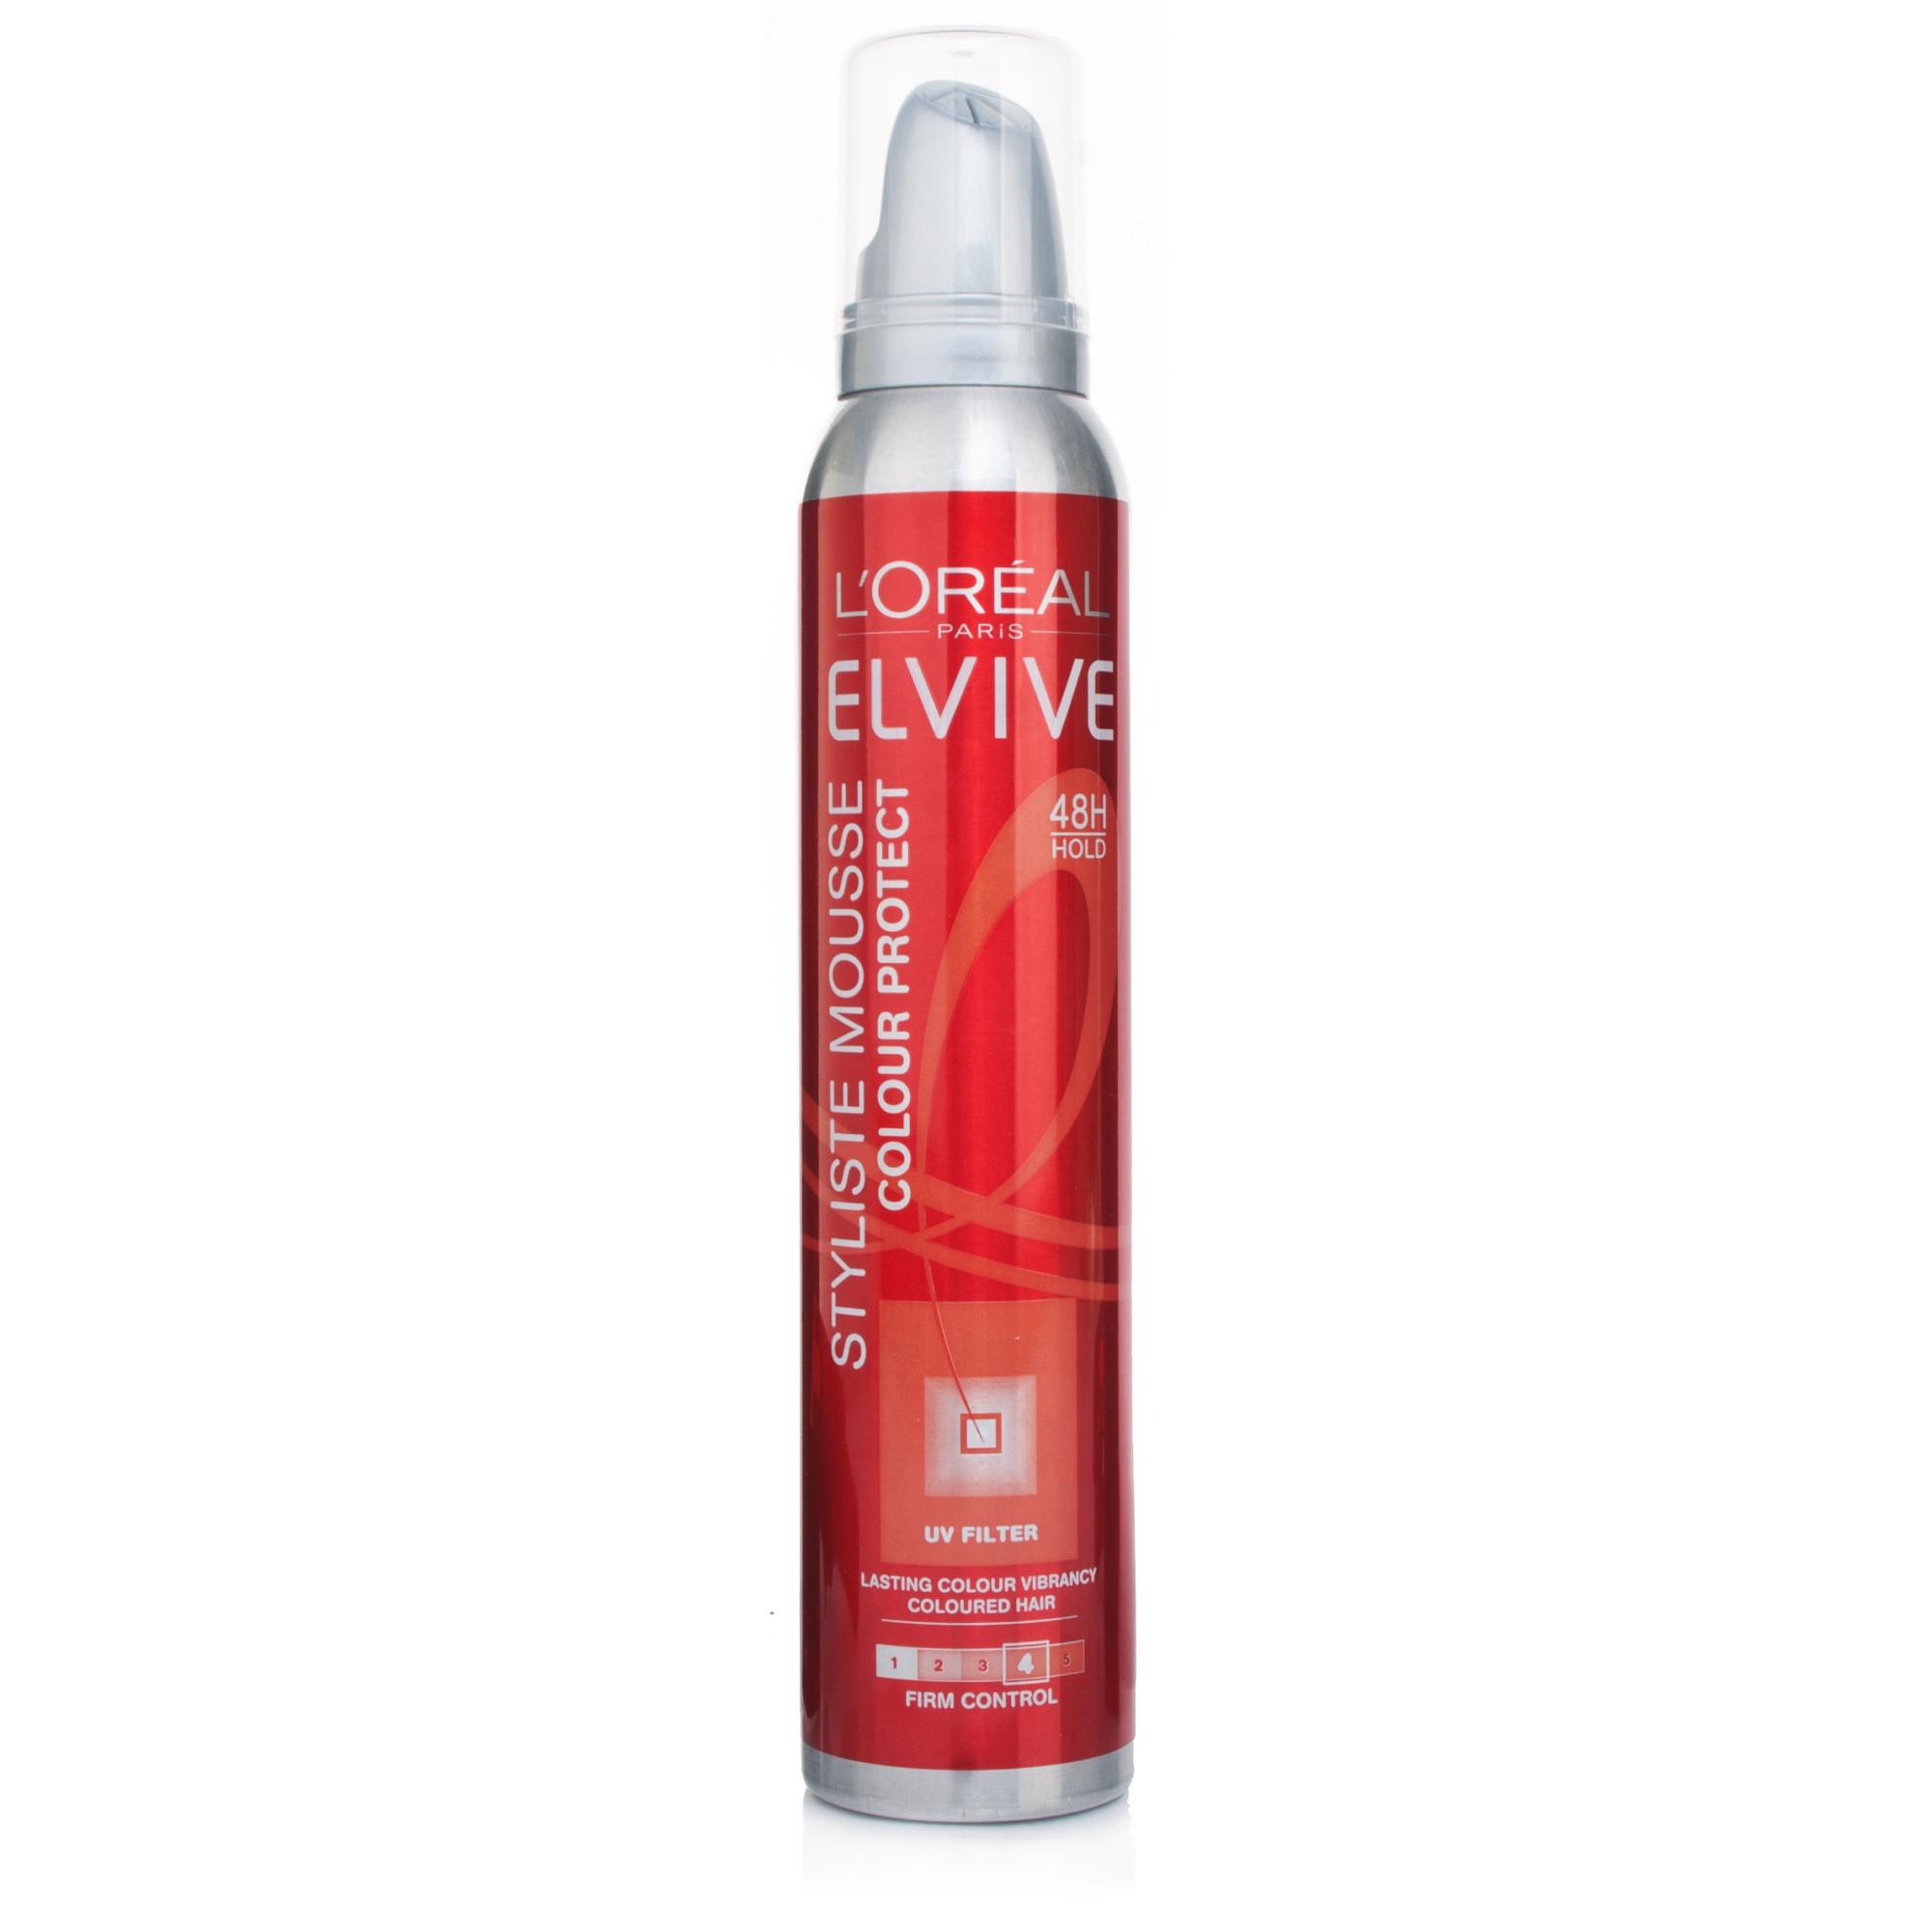 L Oreal Elvive Styliste Mousse Colour Protect Firm Control